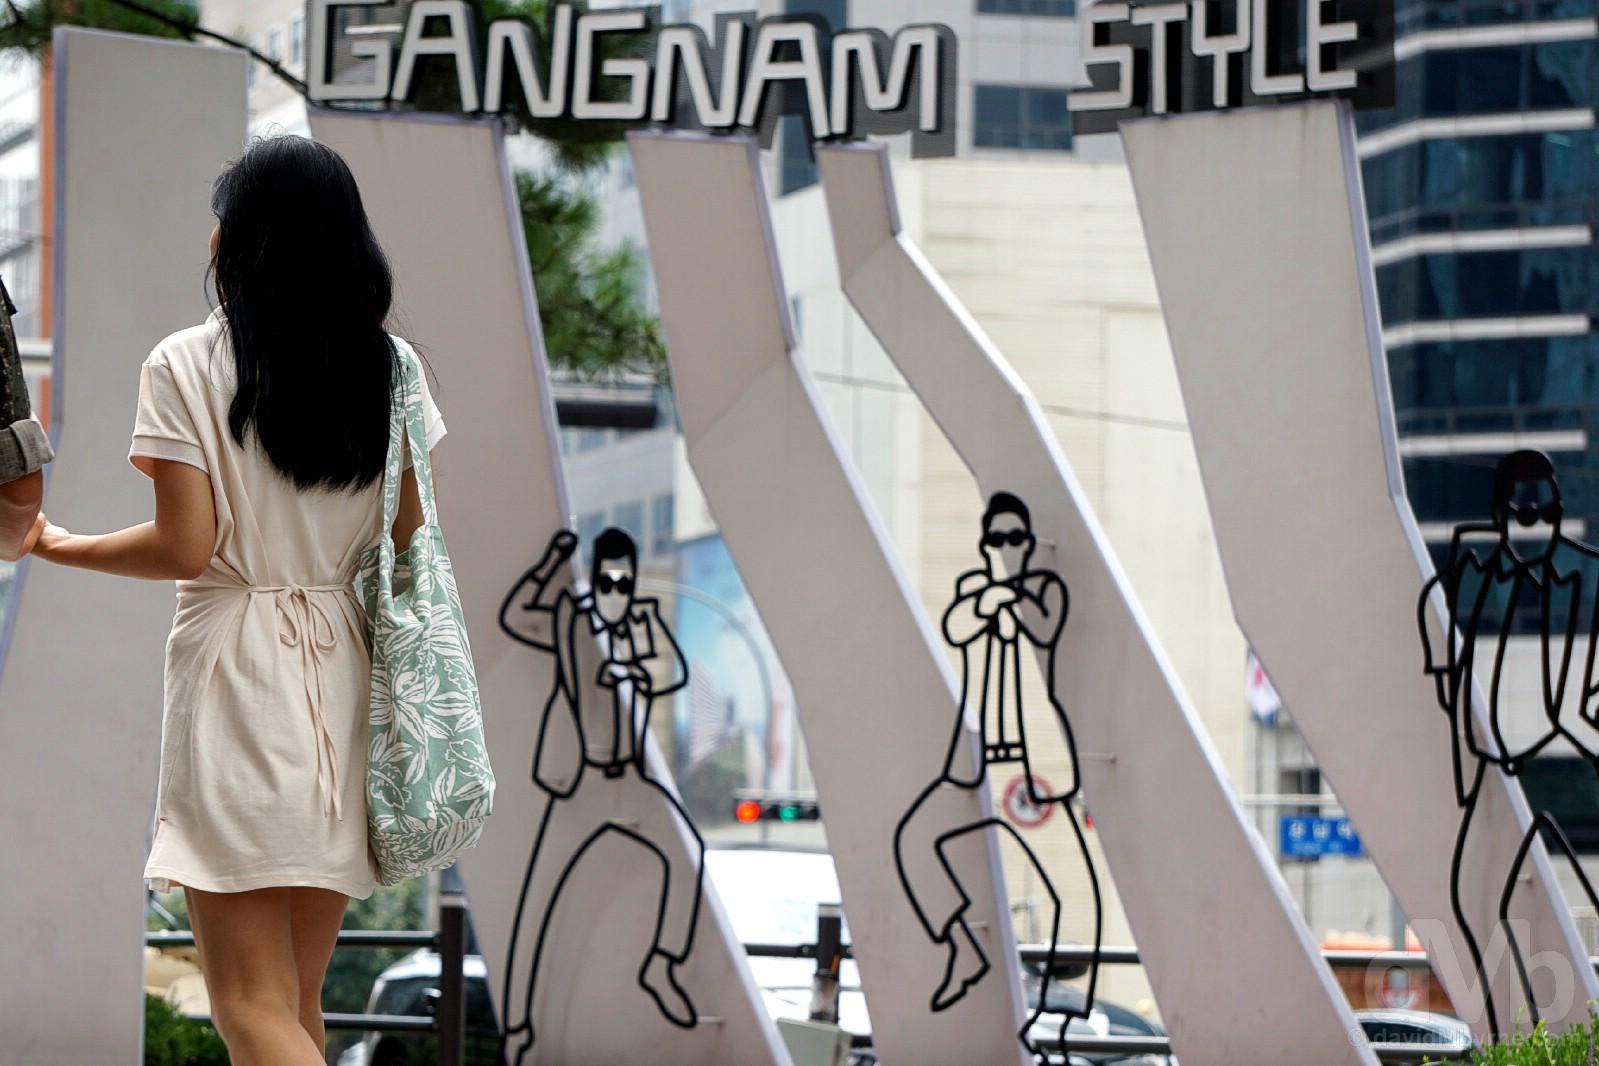 Gangnam style. Gangnam, Seoul, South Korea. August 5, 2017.